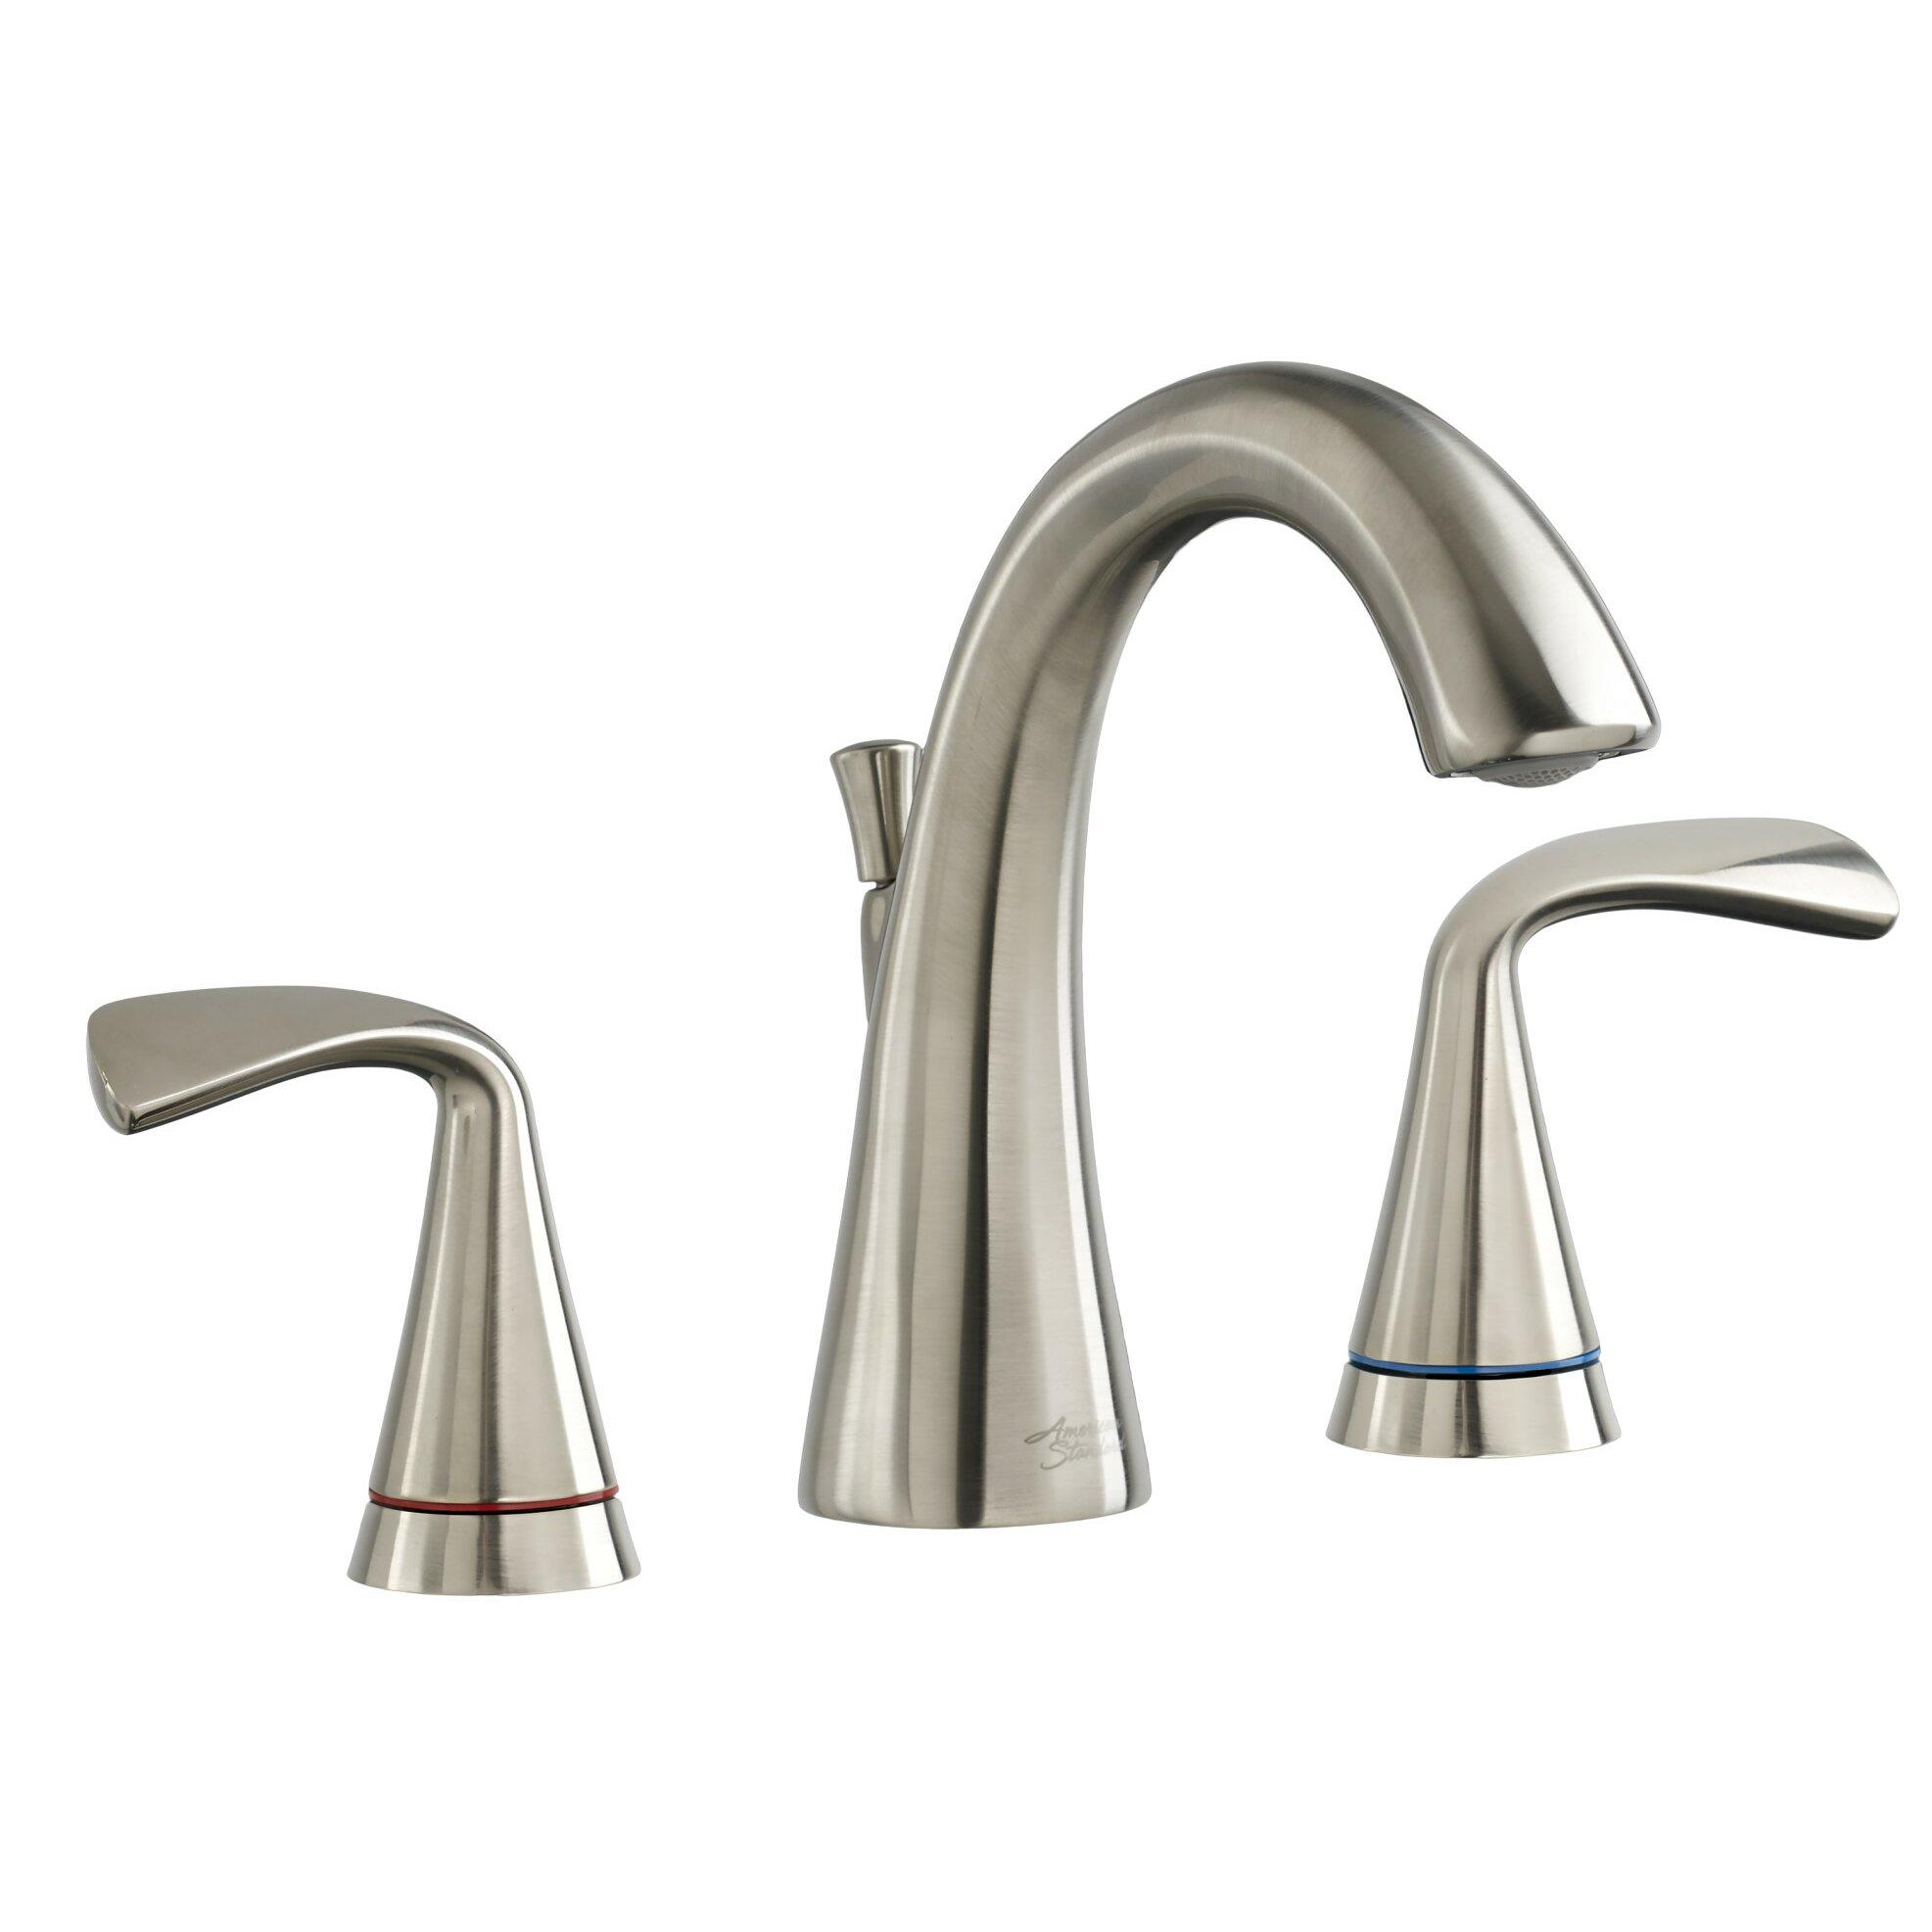 American Standard Fluent Widespread Bathroom Faucet Double